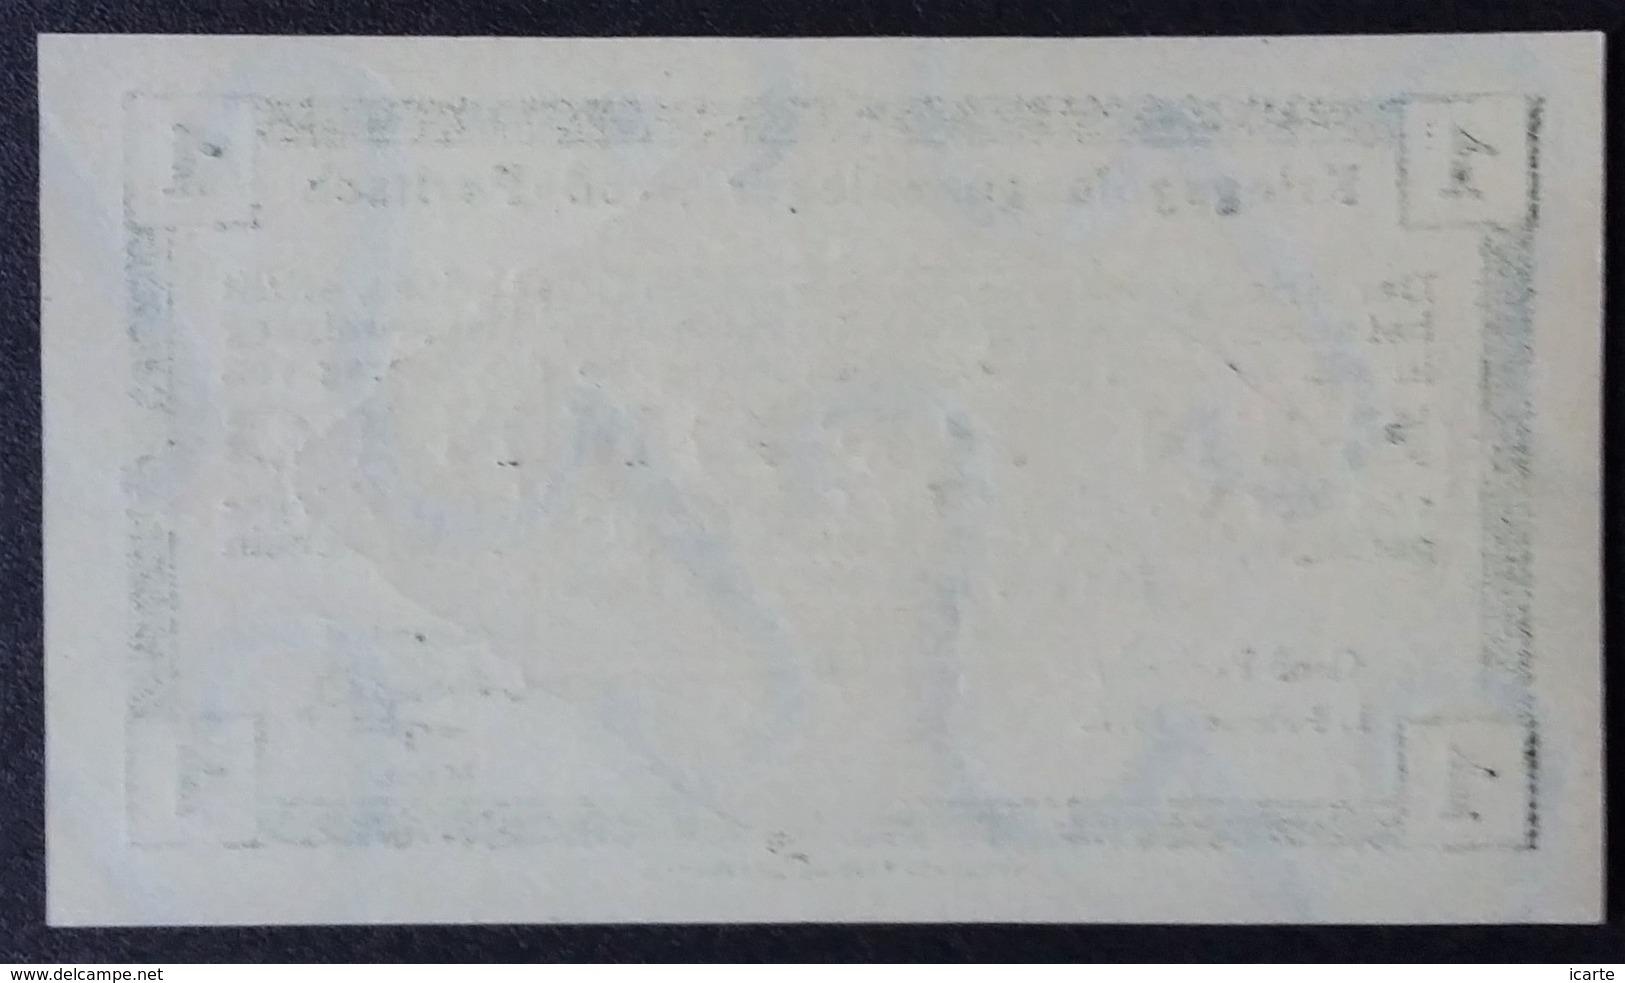 Billet 1 Pfennig LAGERGELD MONNAIE DE CAMP PRISONNIER DE GUERRE Kriegsgefangenenlager GROSS-PORITSCH Porajów POLOGNE - [10] Emissions Militaires